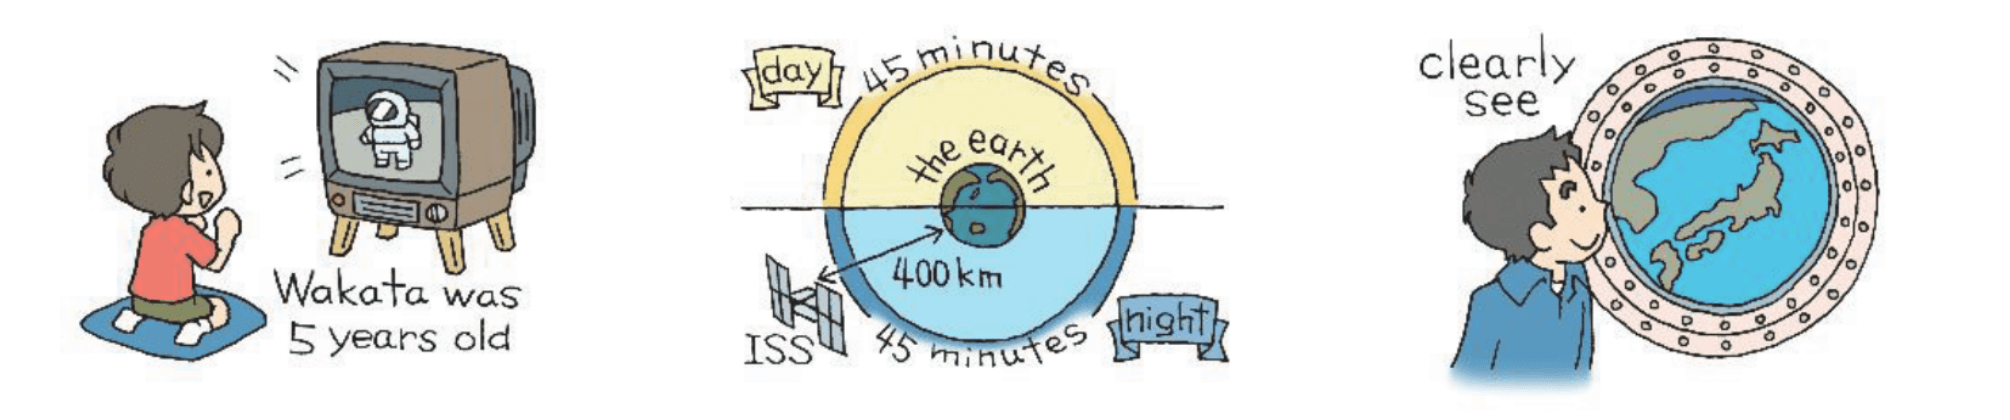 Retelling用のスライドを作成イメージ02